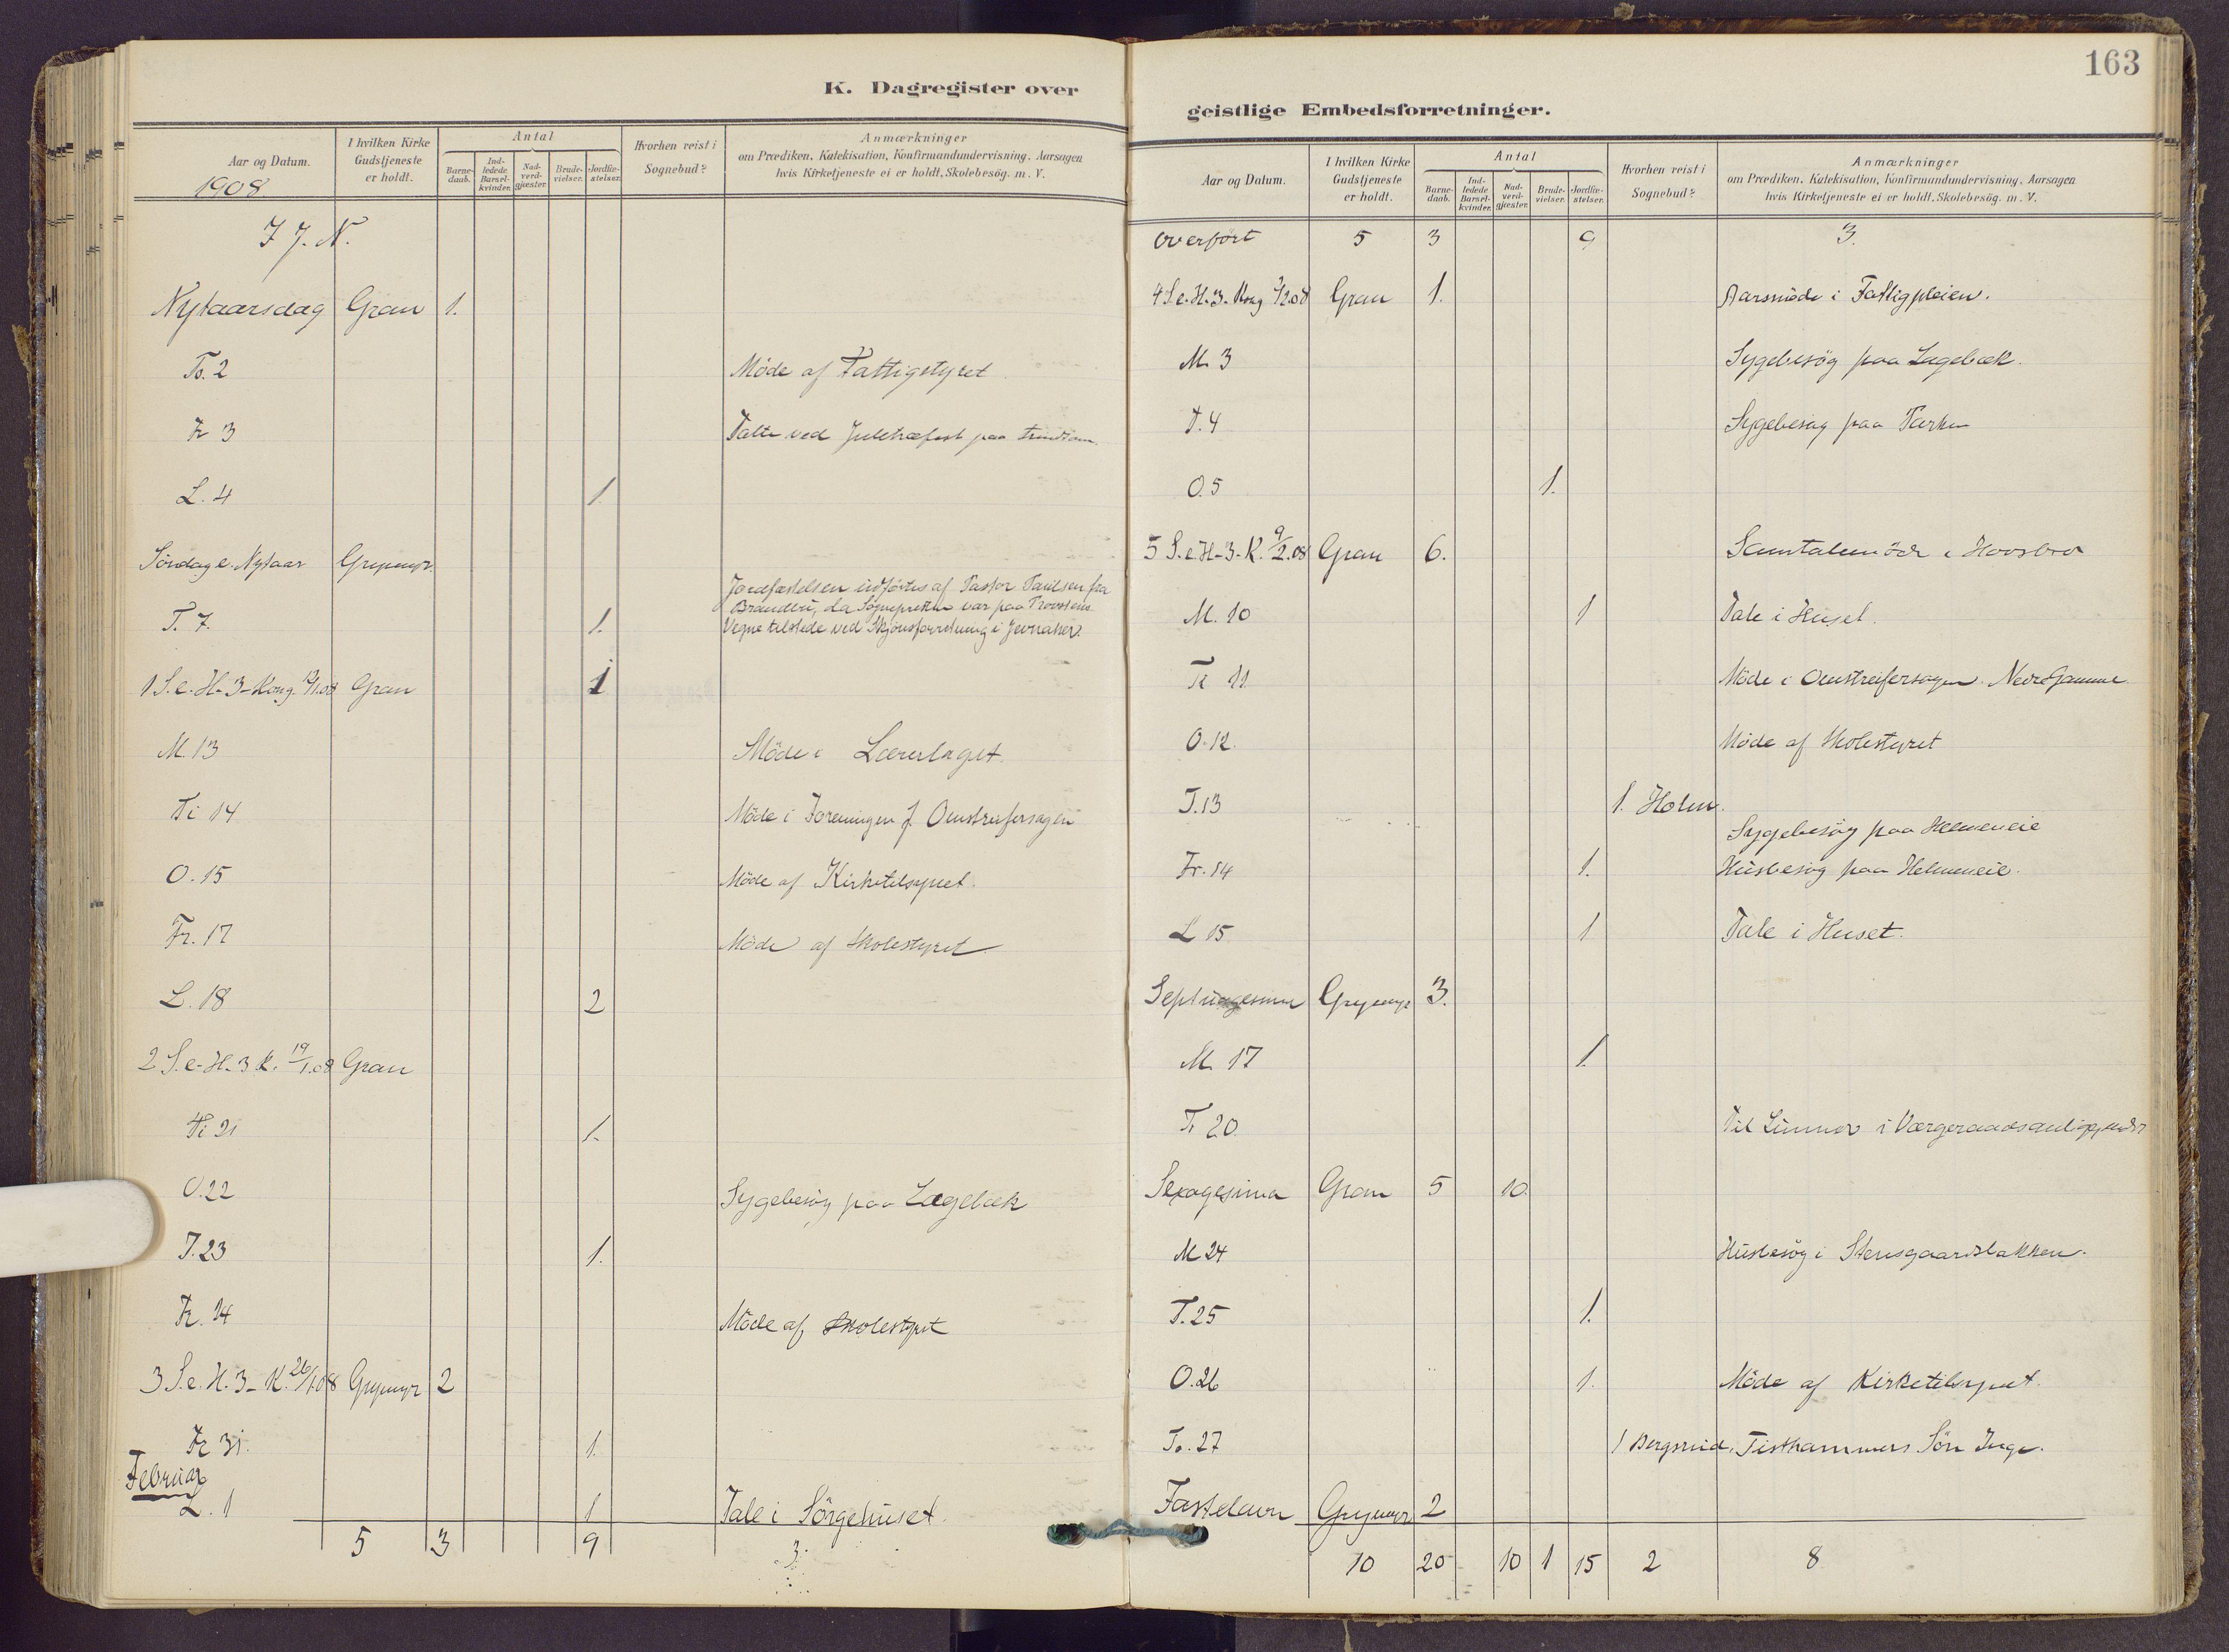 SAH, Gran prestekontor, Ministerialbok nr. 22, 1908-1918, s. 163